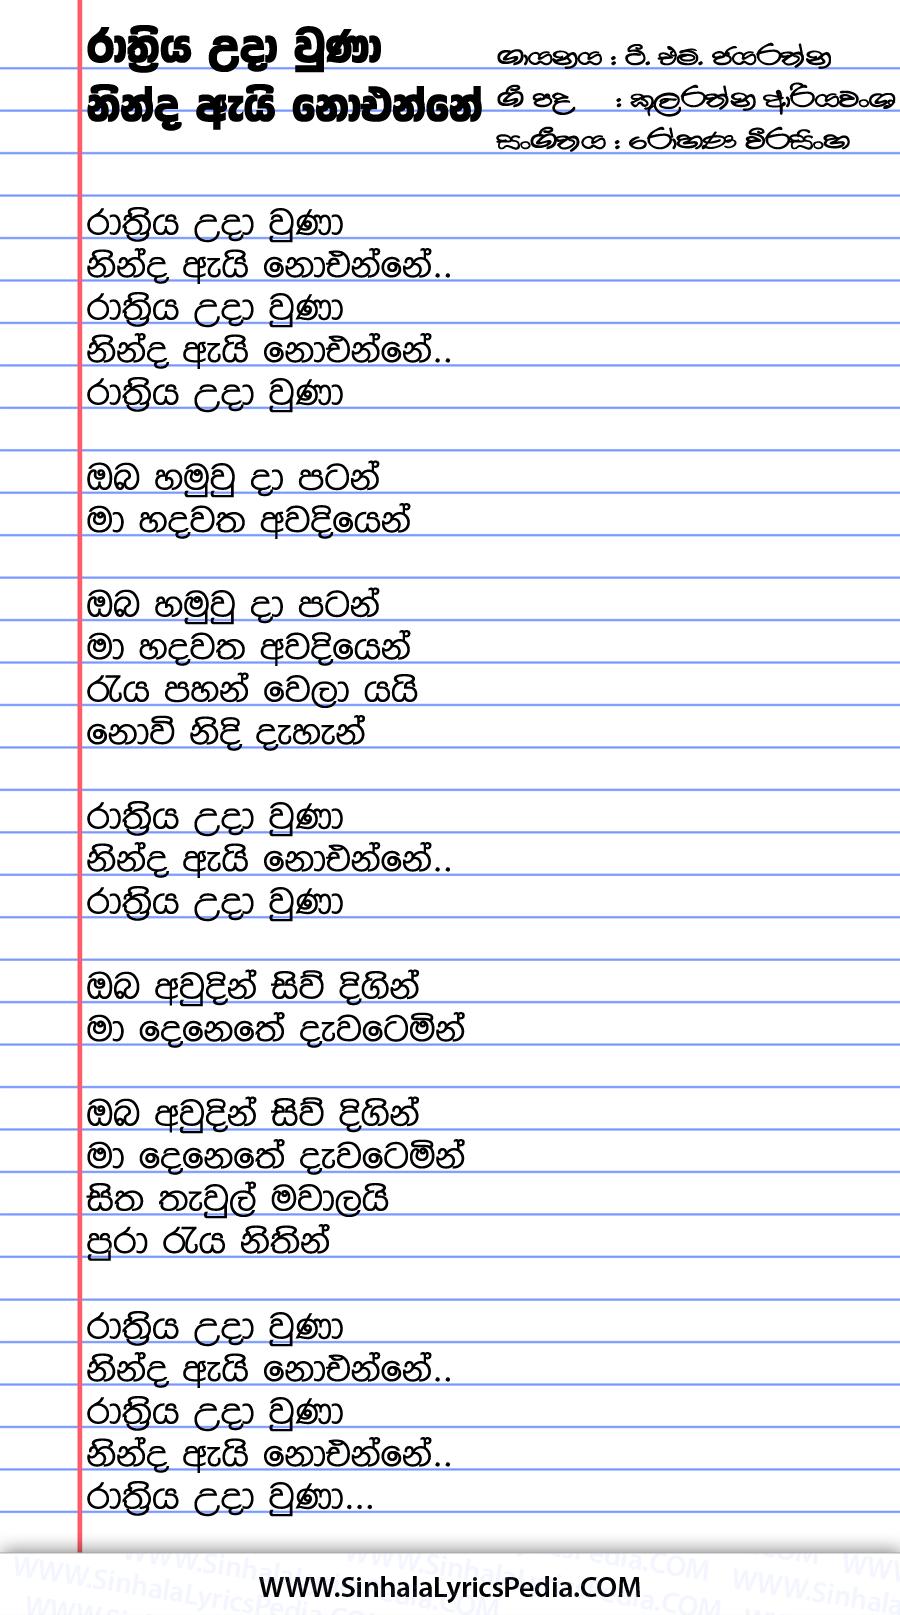 Rathriya Uda Una Ninda Ai Noenne Song Lyrics